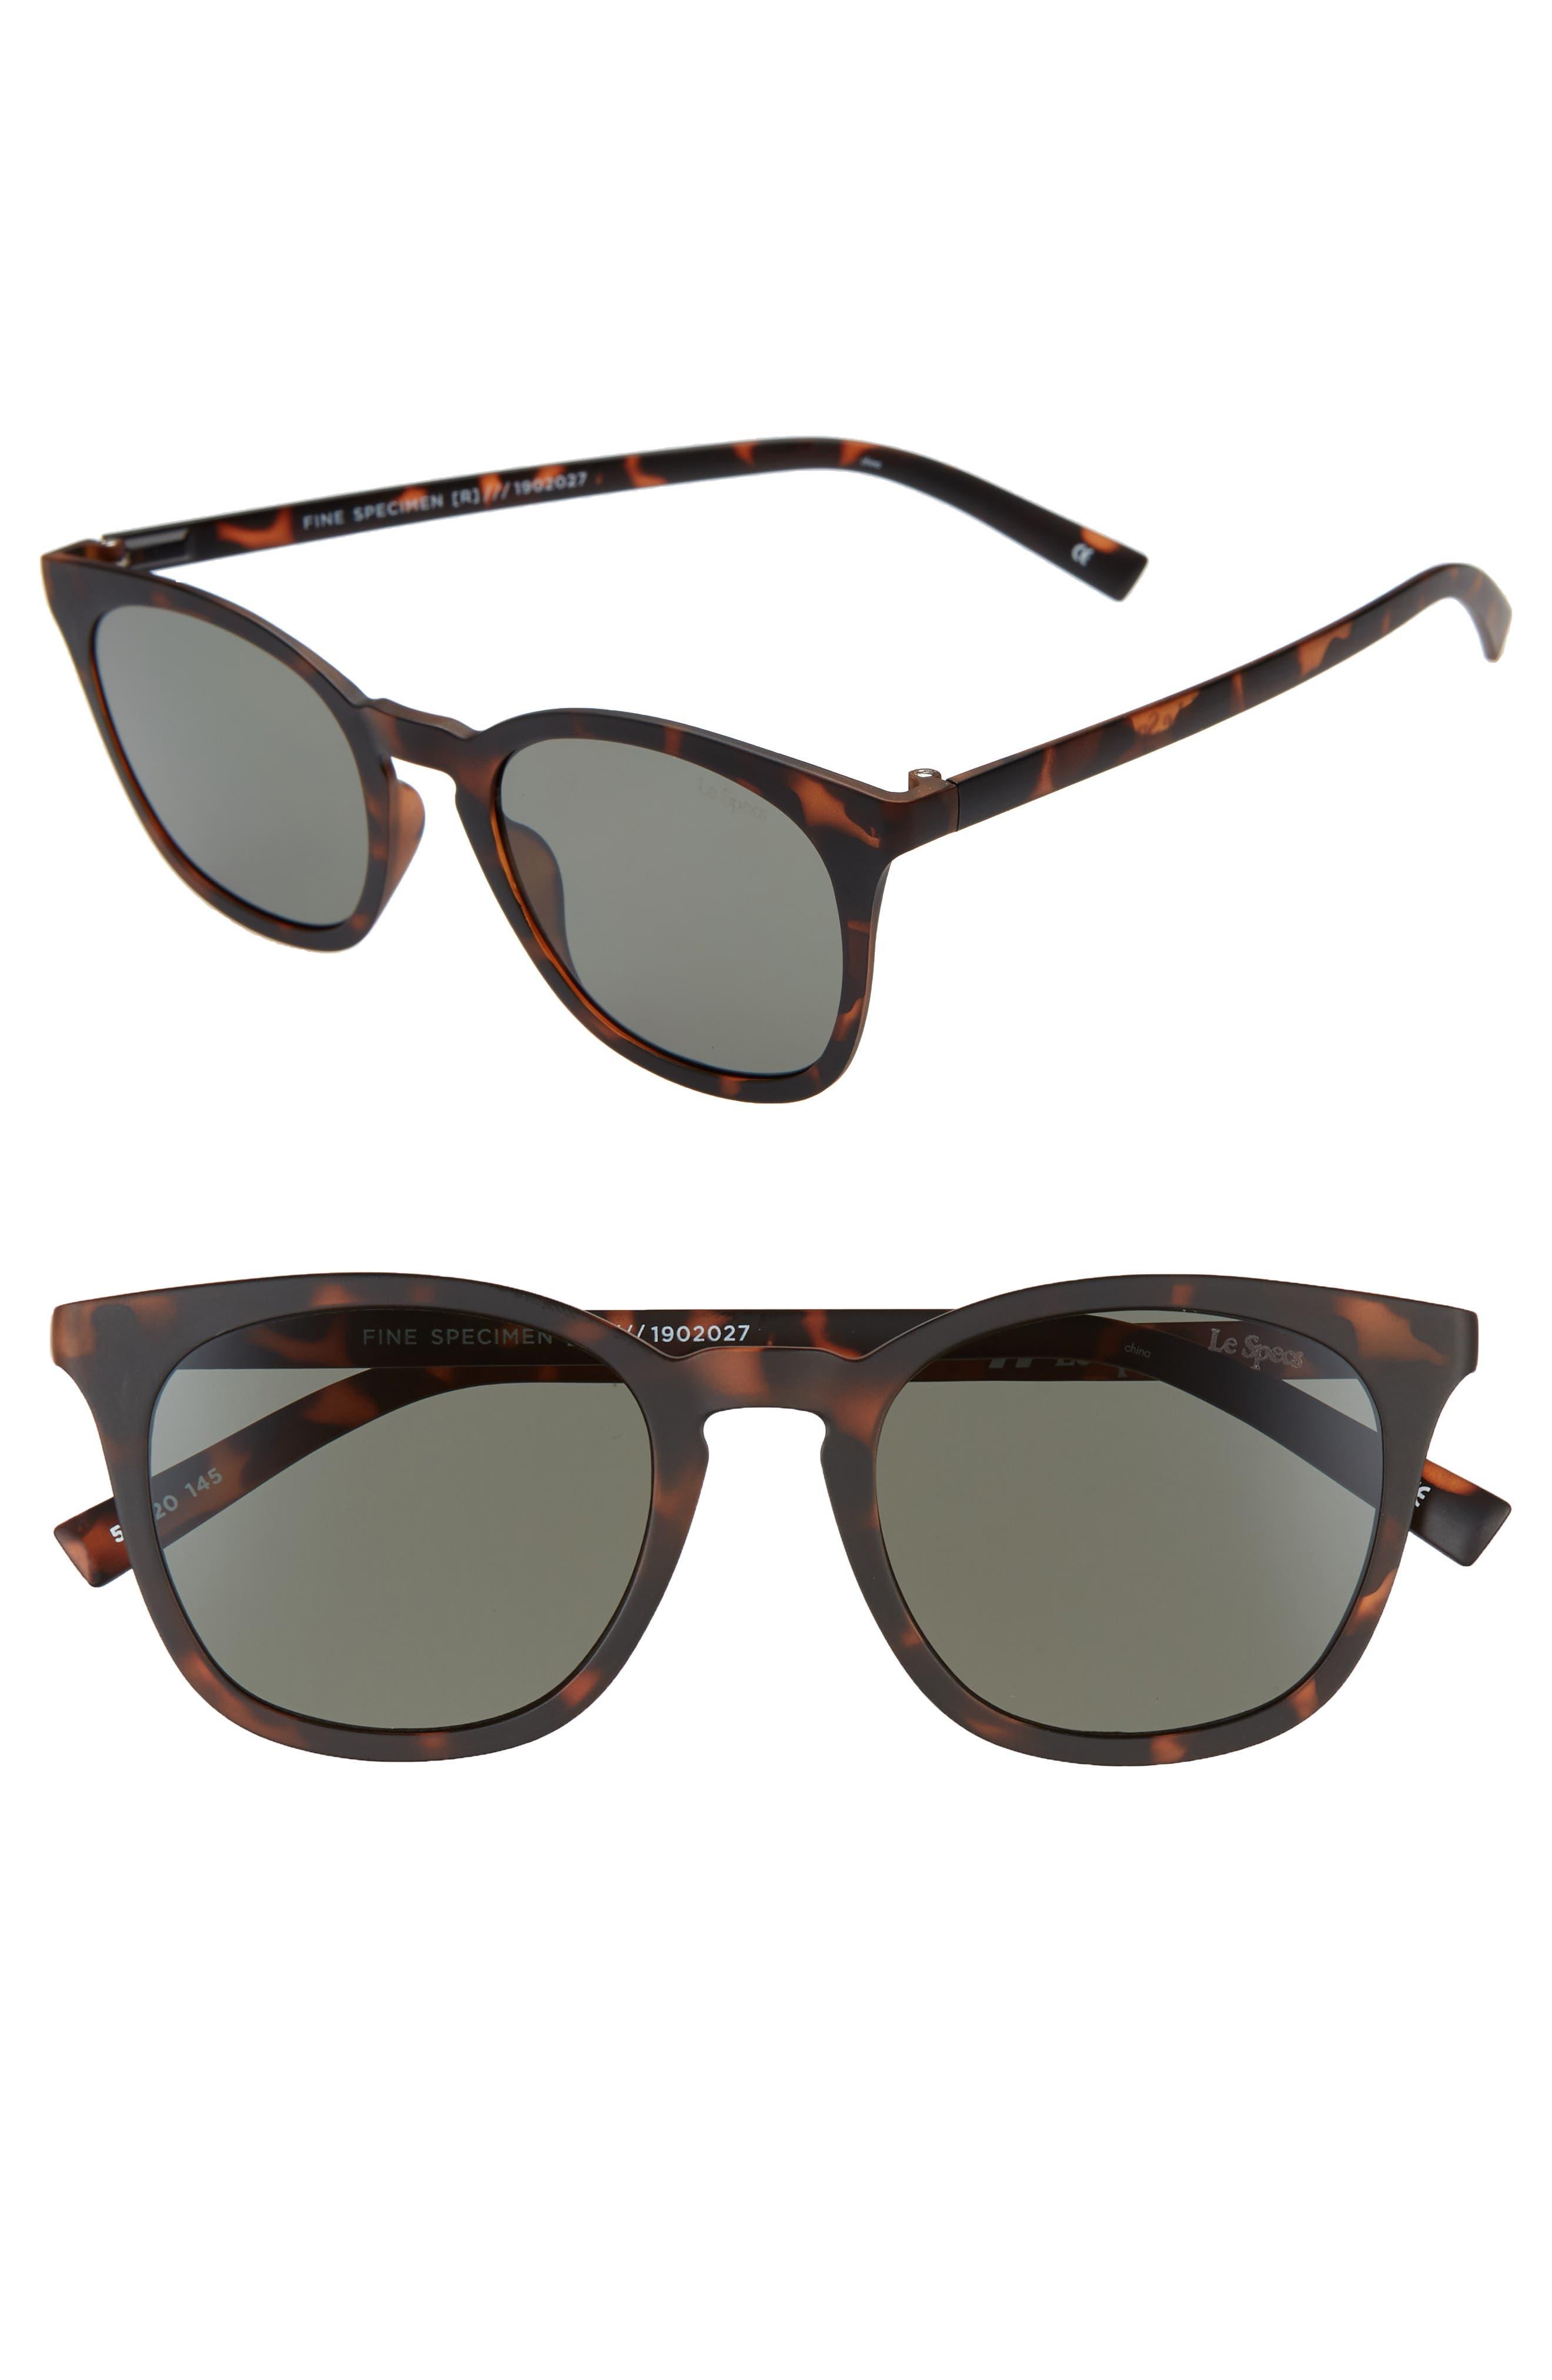 Le Specs Fine Specimen 51Mm Square Sunglasses - Matte Tortoise/ Khaki